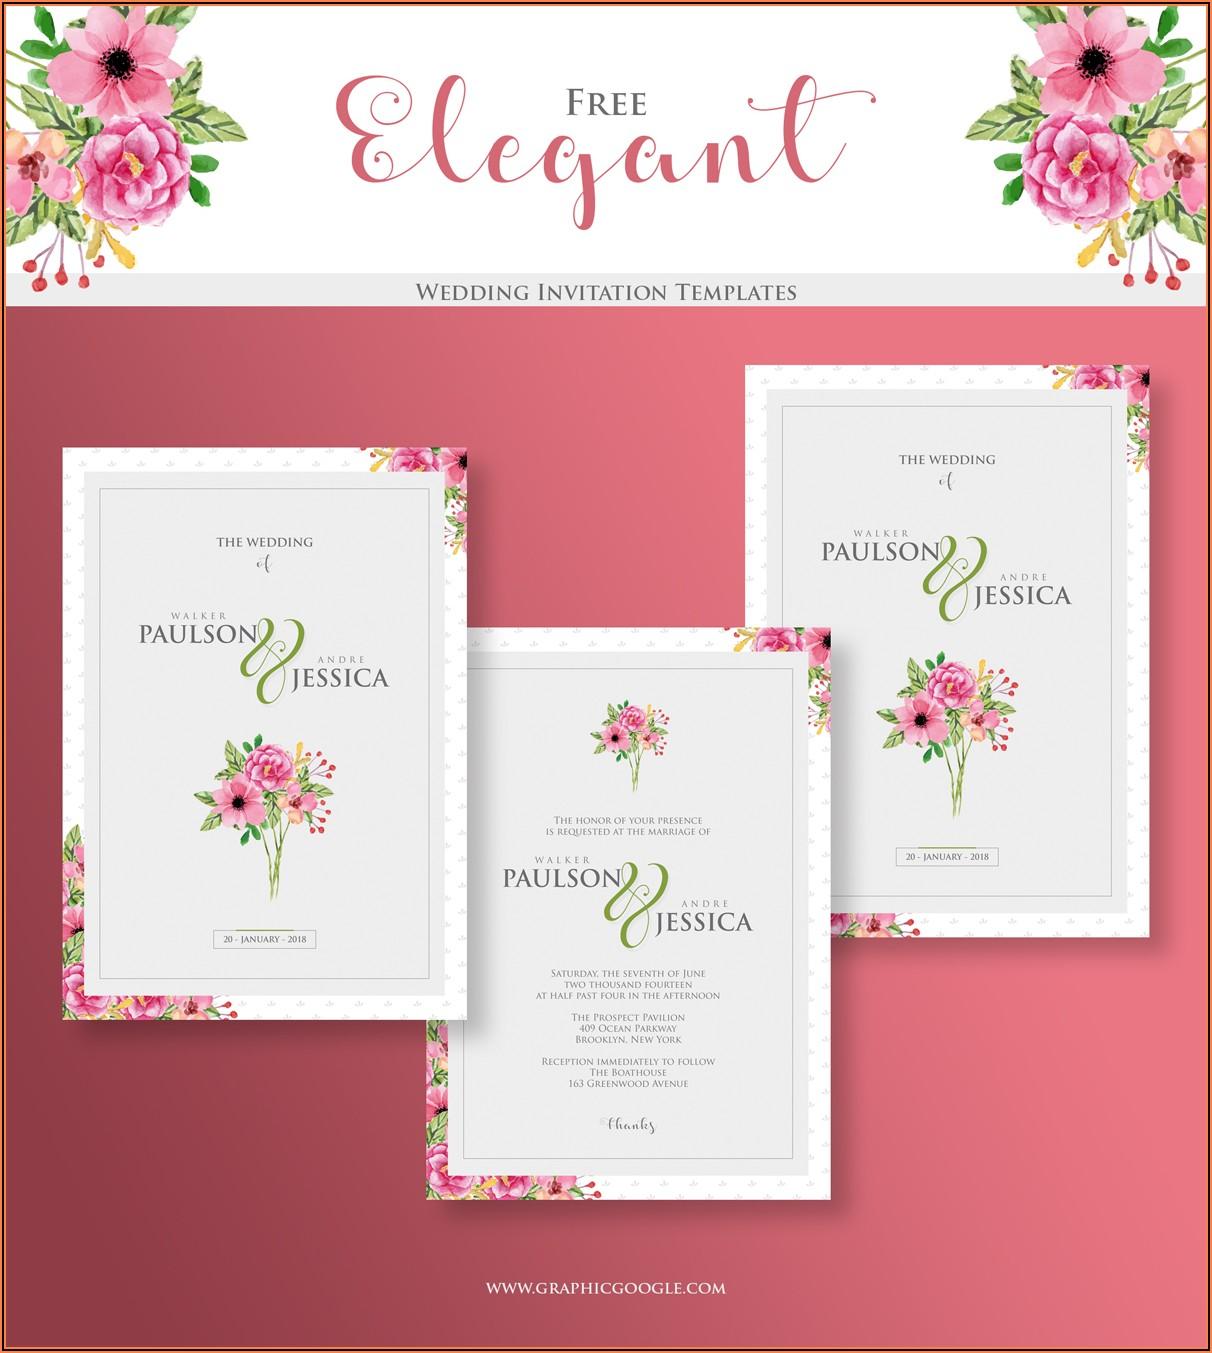 Elegant Wedding Invitations Templates